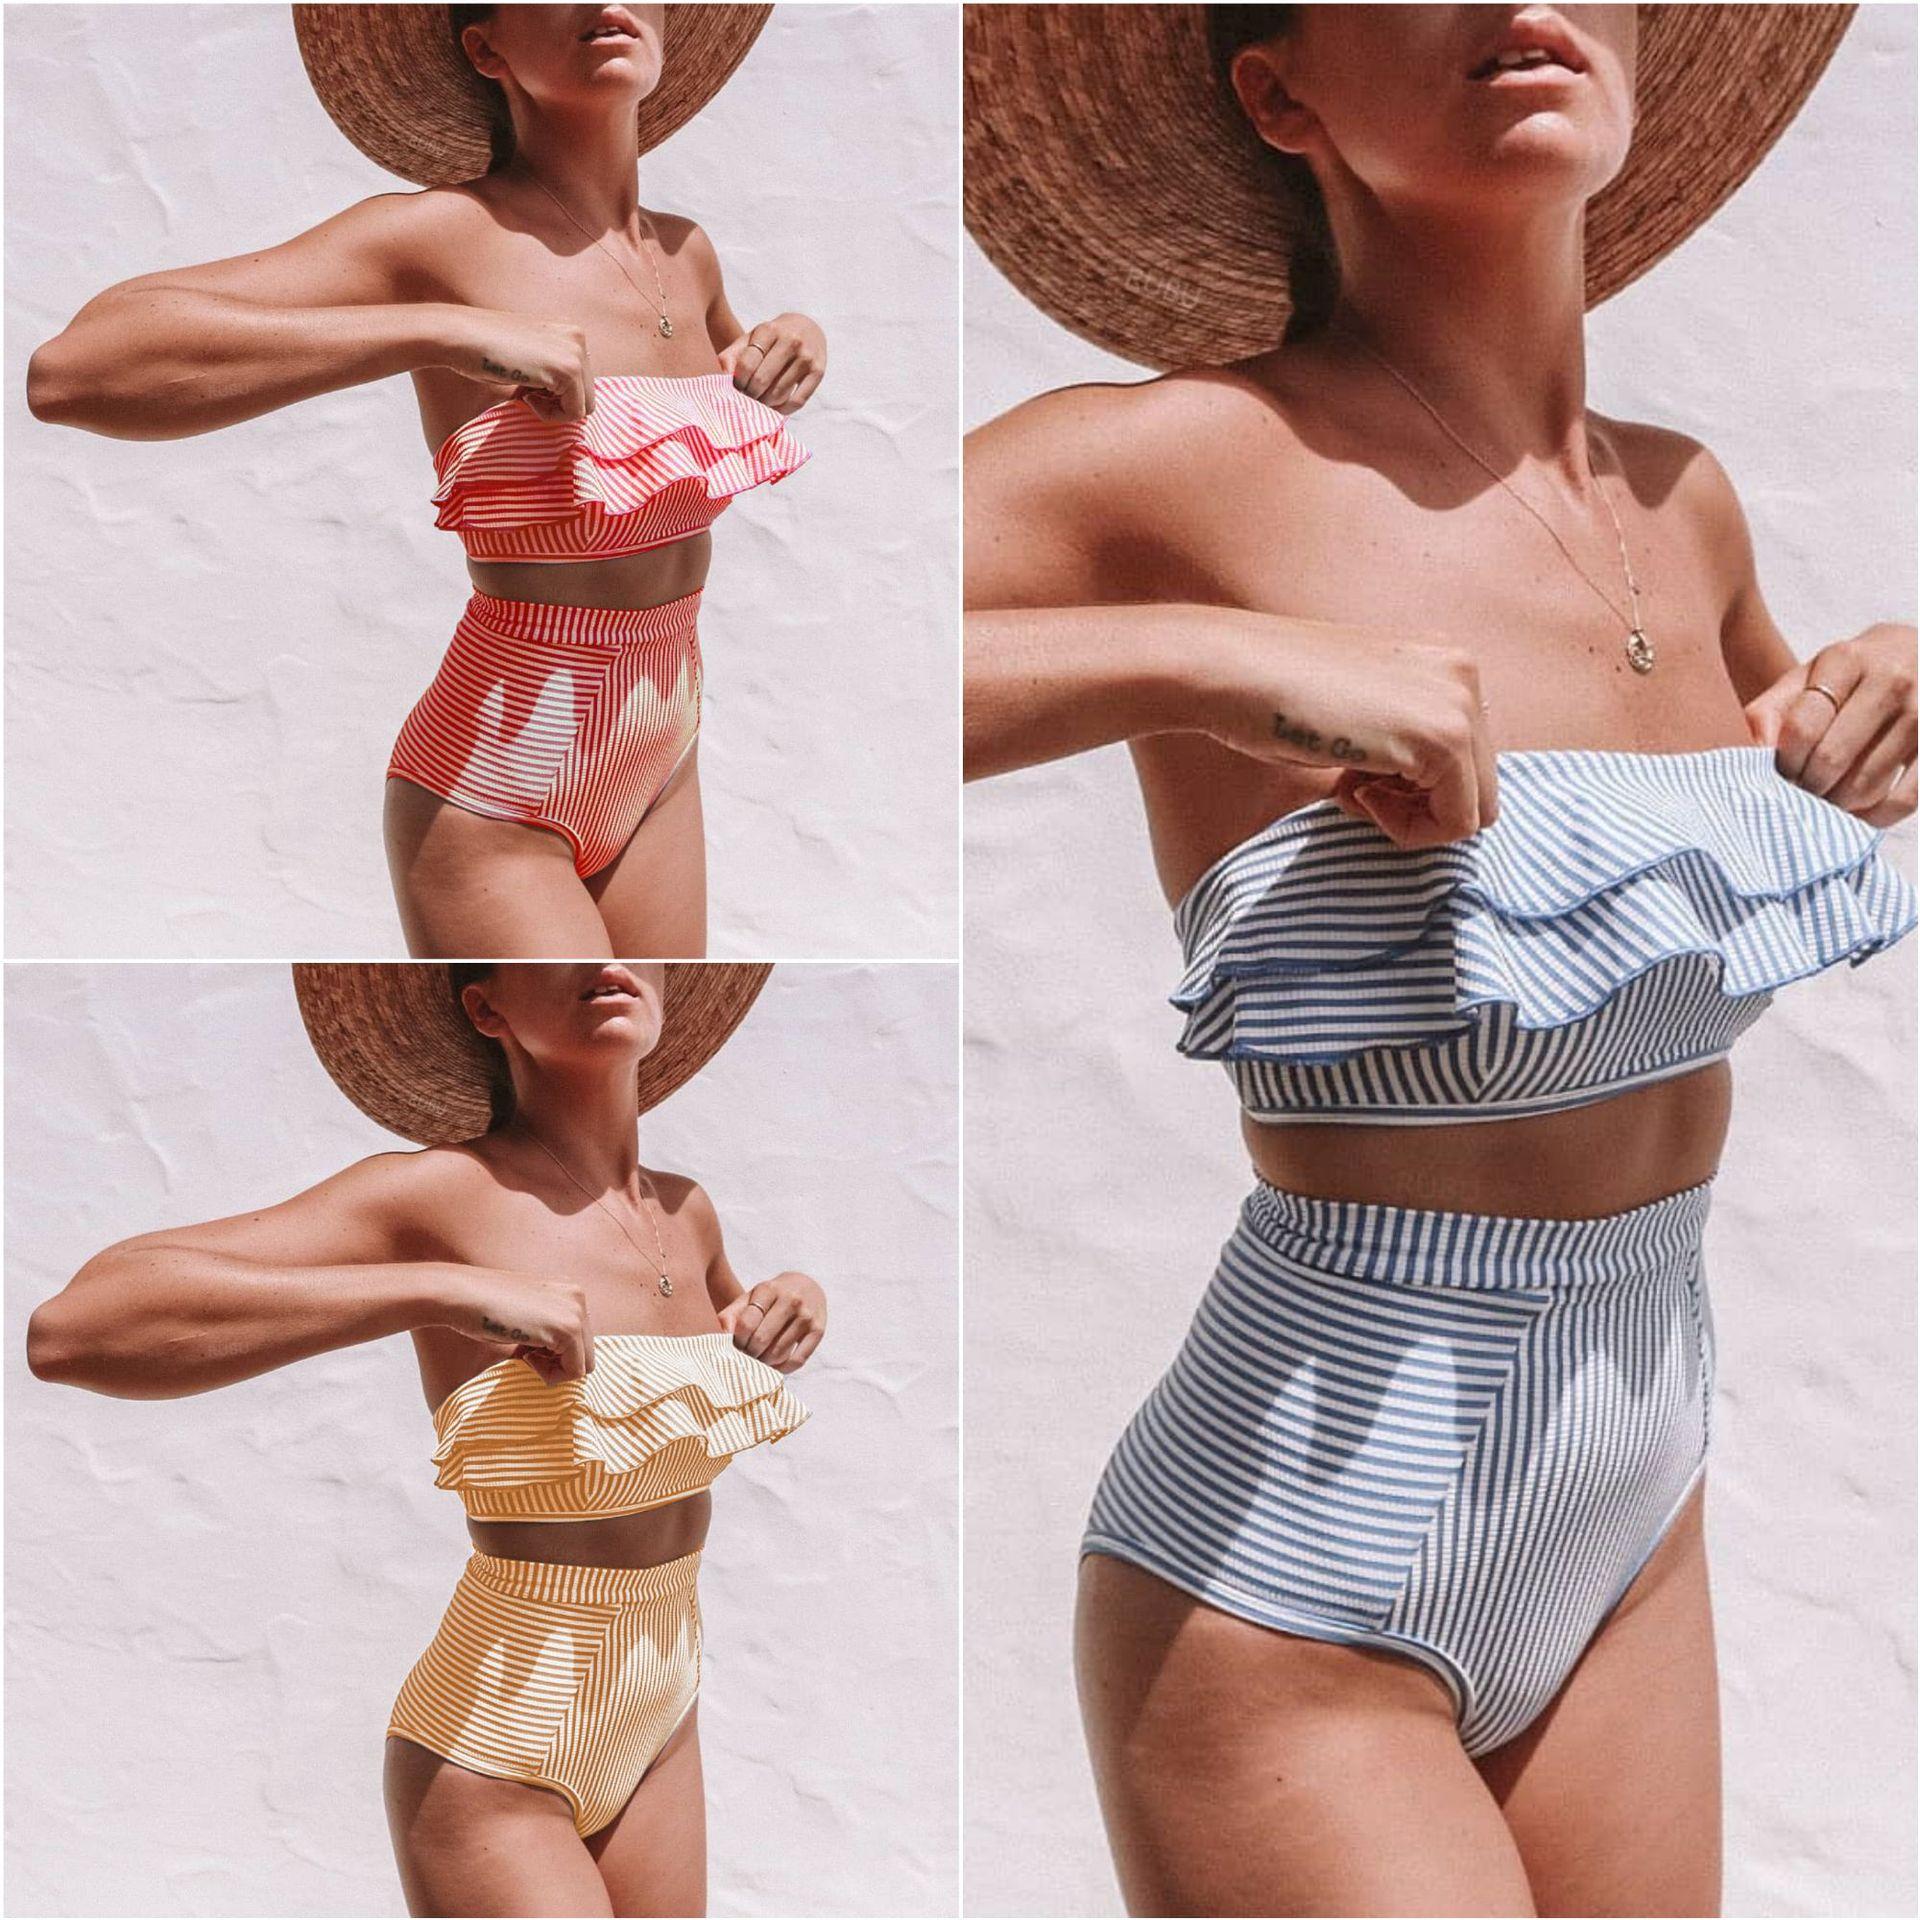 Sexy Retro Blue White Striped Bandeau High Waist Bikini 2019 Lady Swimwear Women Swimsuit Female Ruffle Sexy Retro Blue White Striped Bandeau High Waist Bikini 2019 Lady Swimwear Women Swimsuit Female Ruffle Ruched Swim Bathing Suit